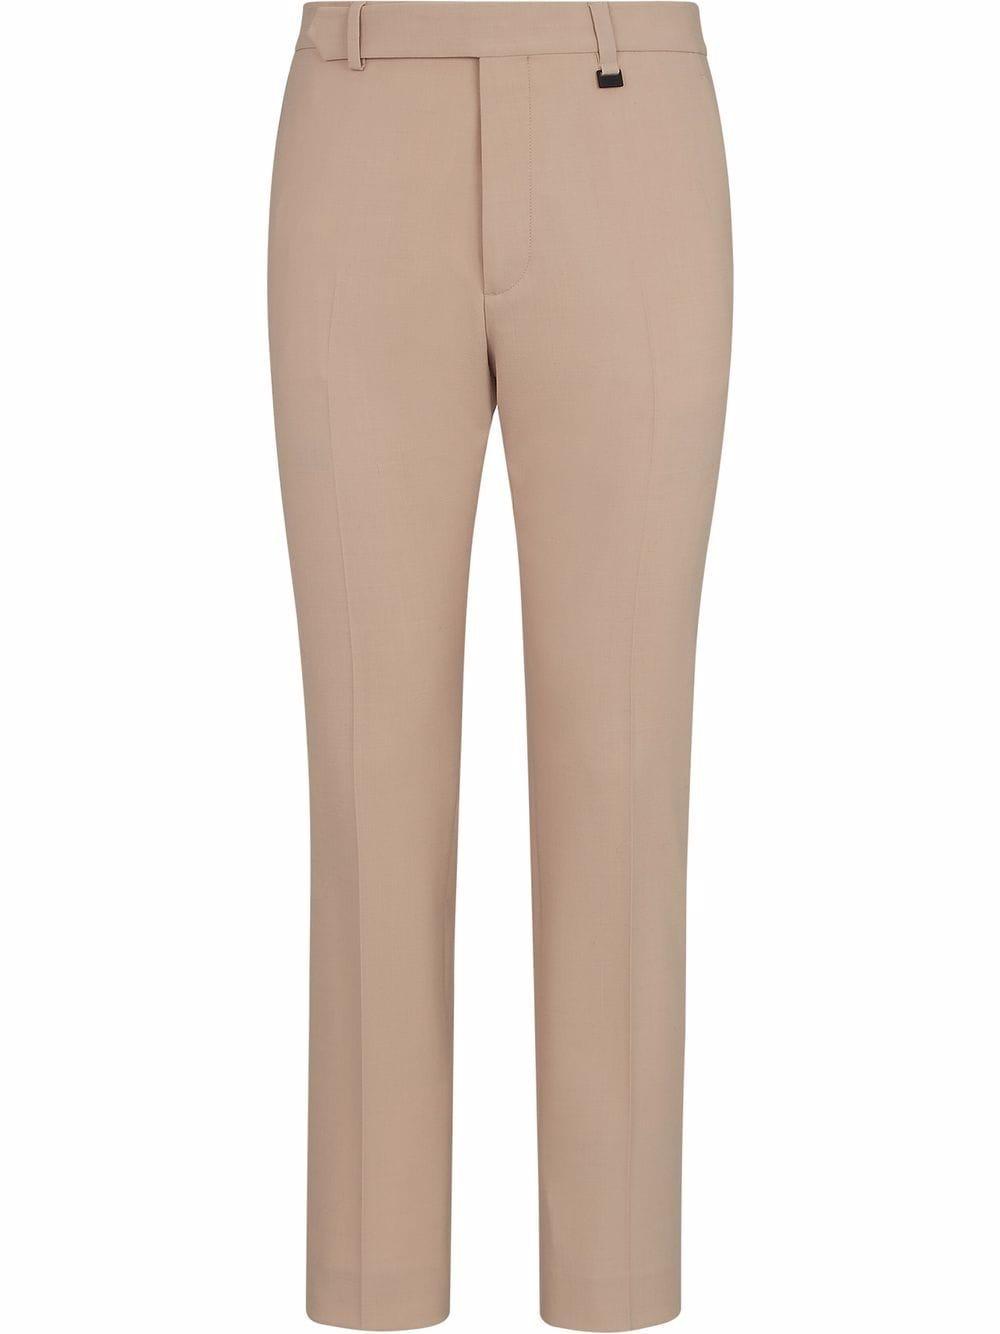 Beige wool slim-fit tailored trousers featuring gold-tone Fendi logo FENDI |  | FB0720-AGYEF0VG0